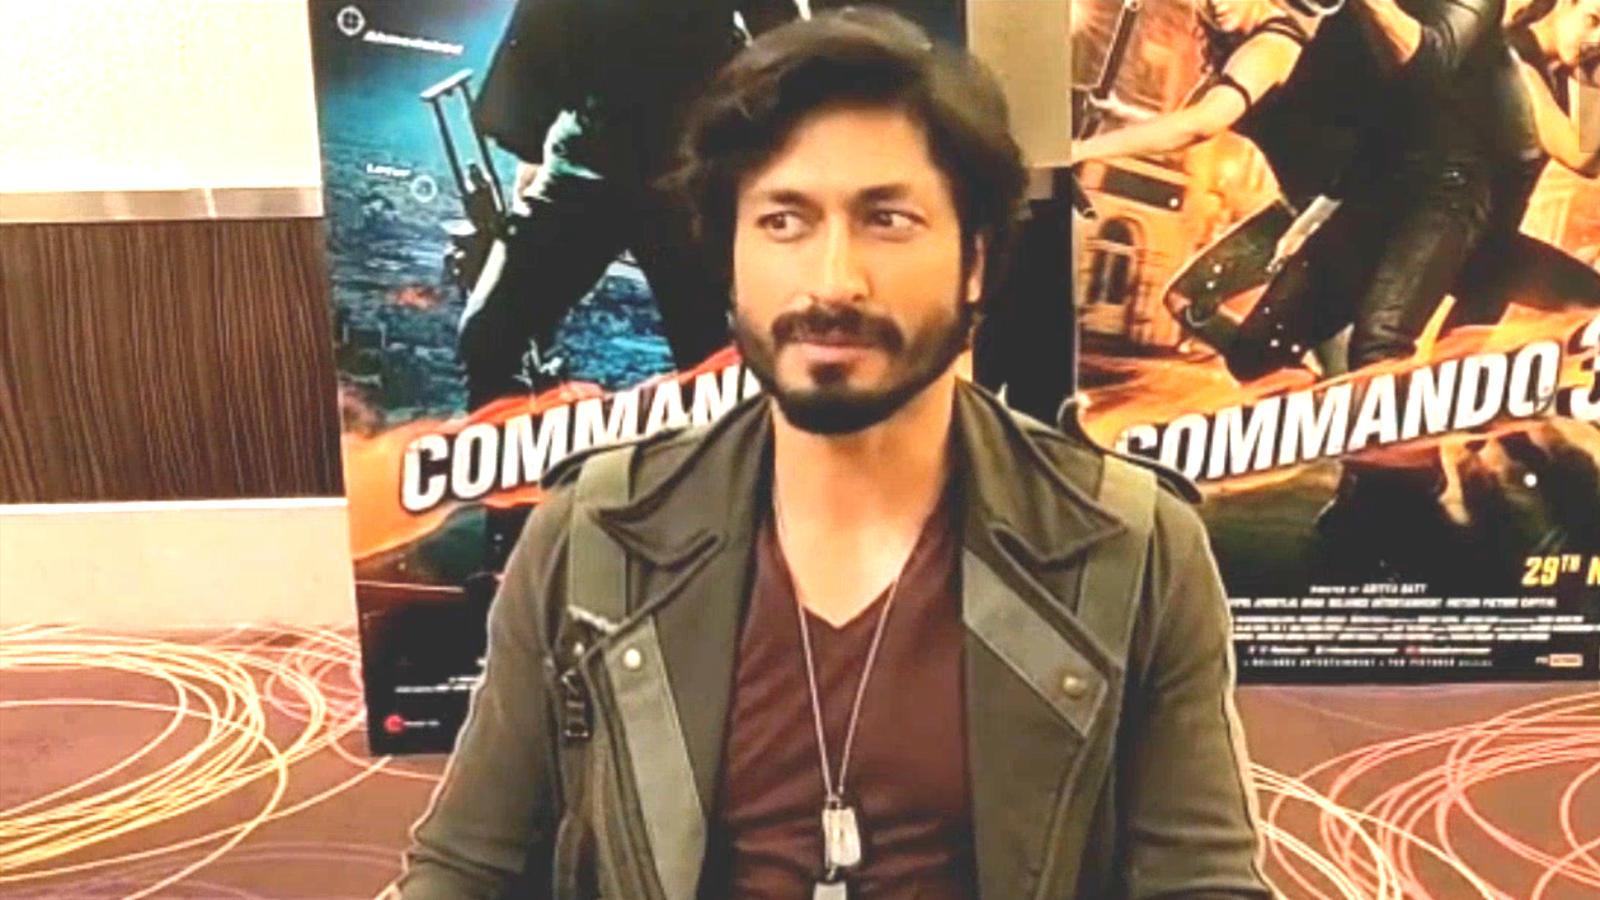 commando-3-star-vidyut-jammwal-shares-his-sunday-plans